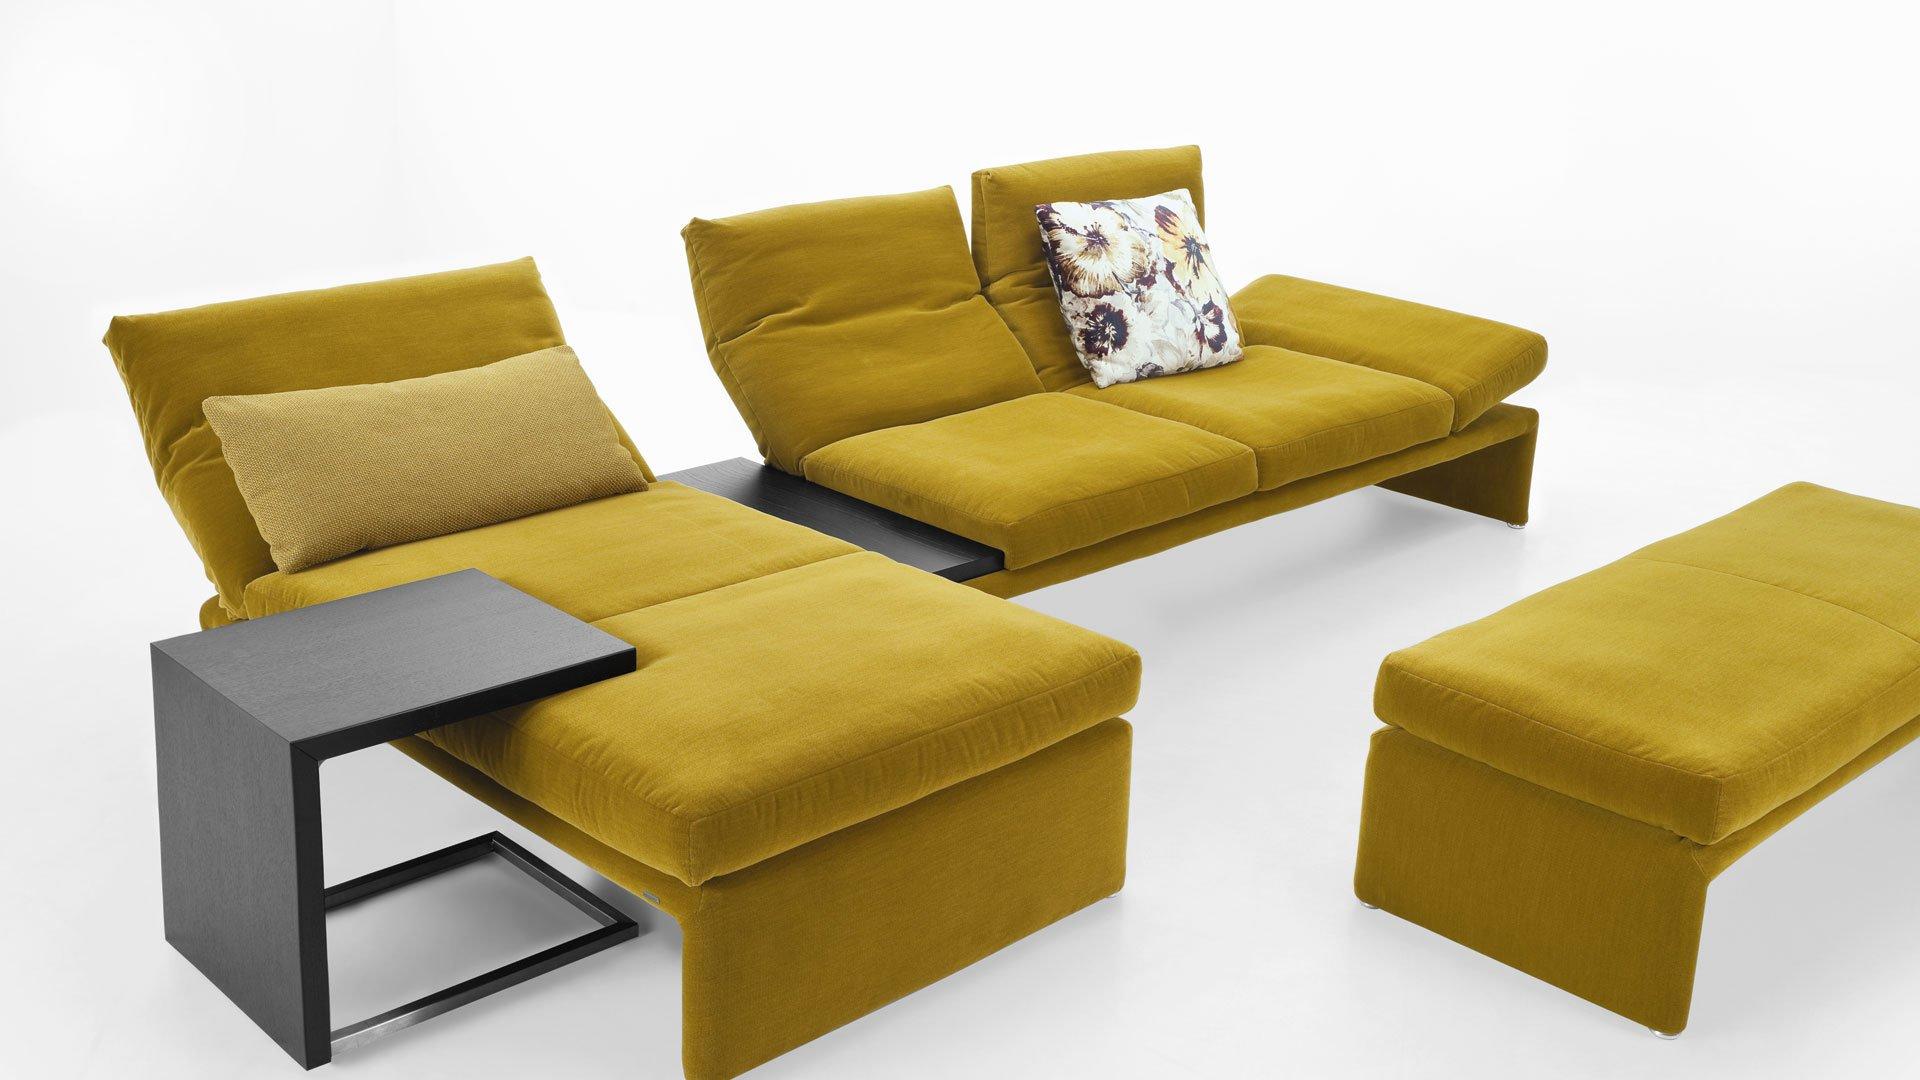 raoul home style. Black Bedroom Furniture Sets. Home Design Ideas